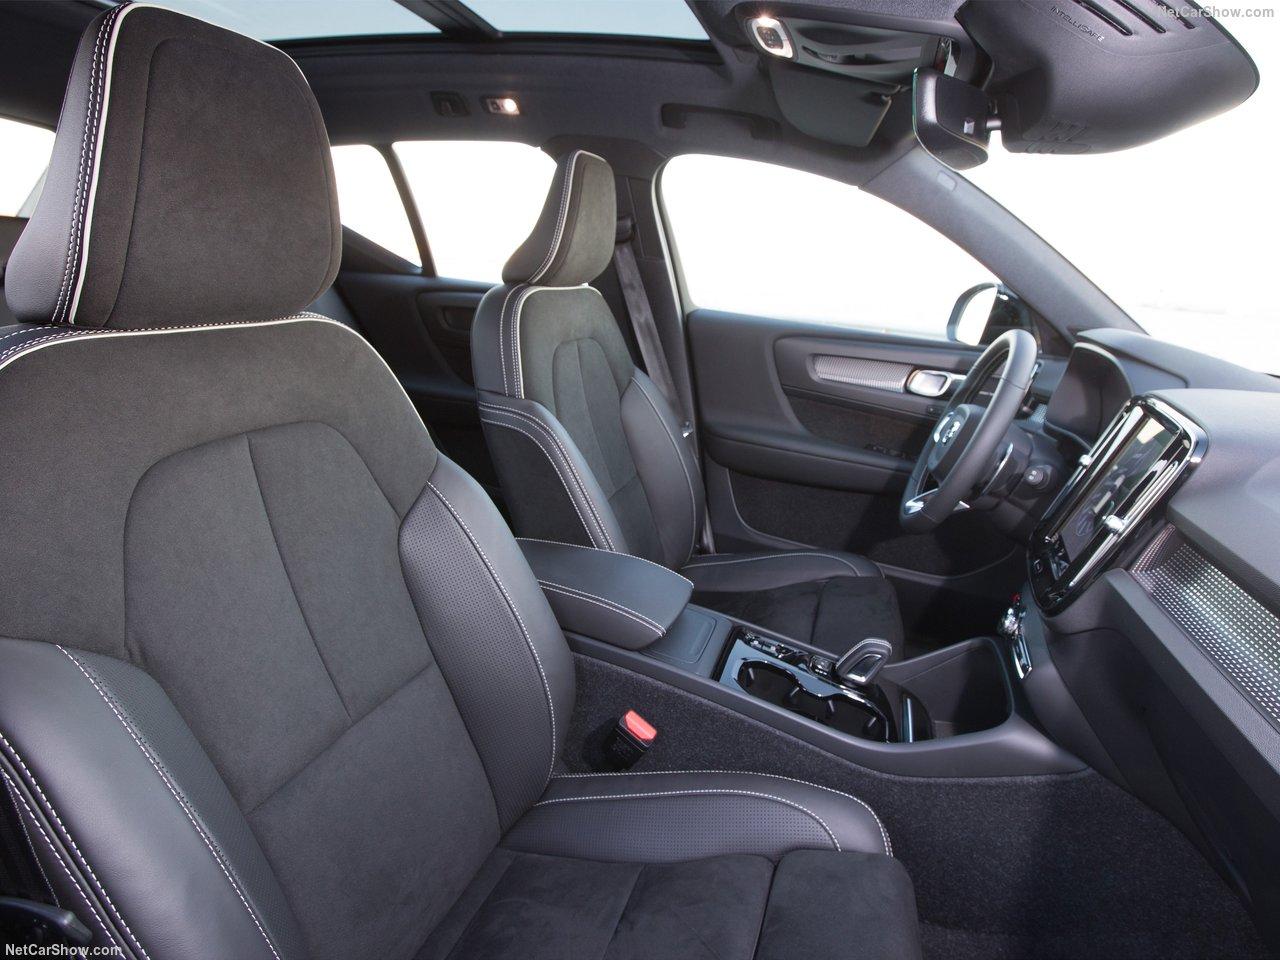 Volvo-XC40-2018-1280-6a.jpg